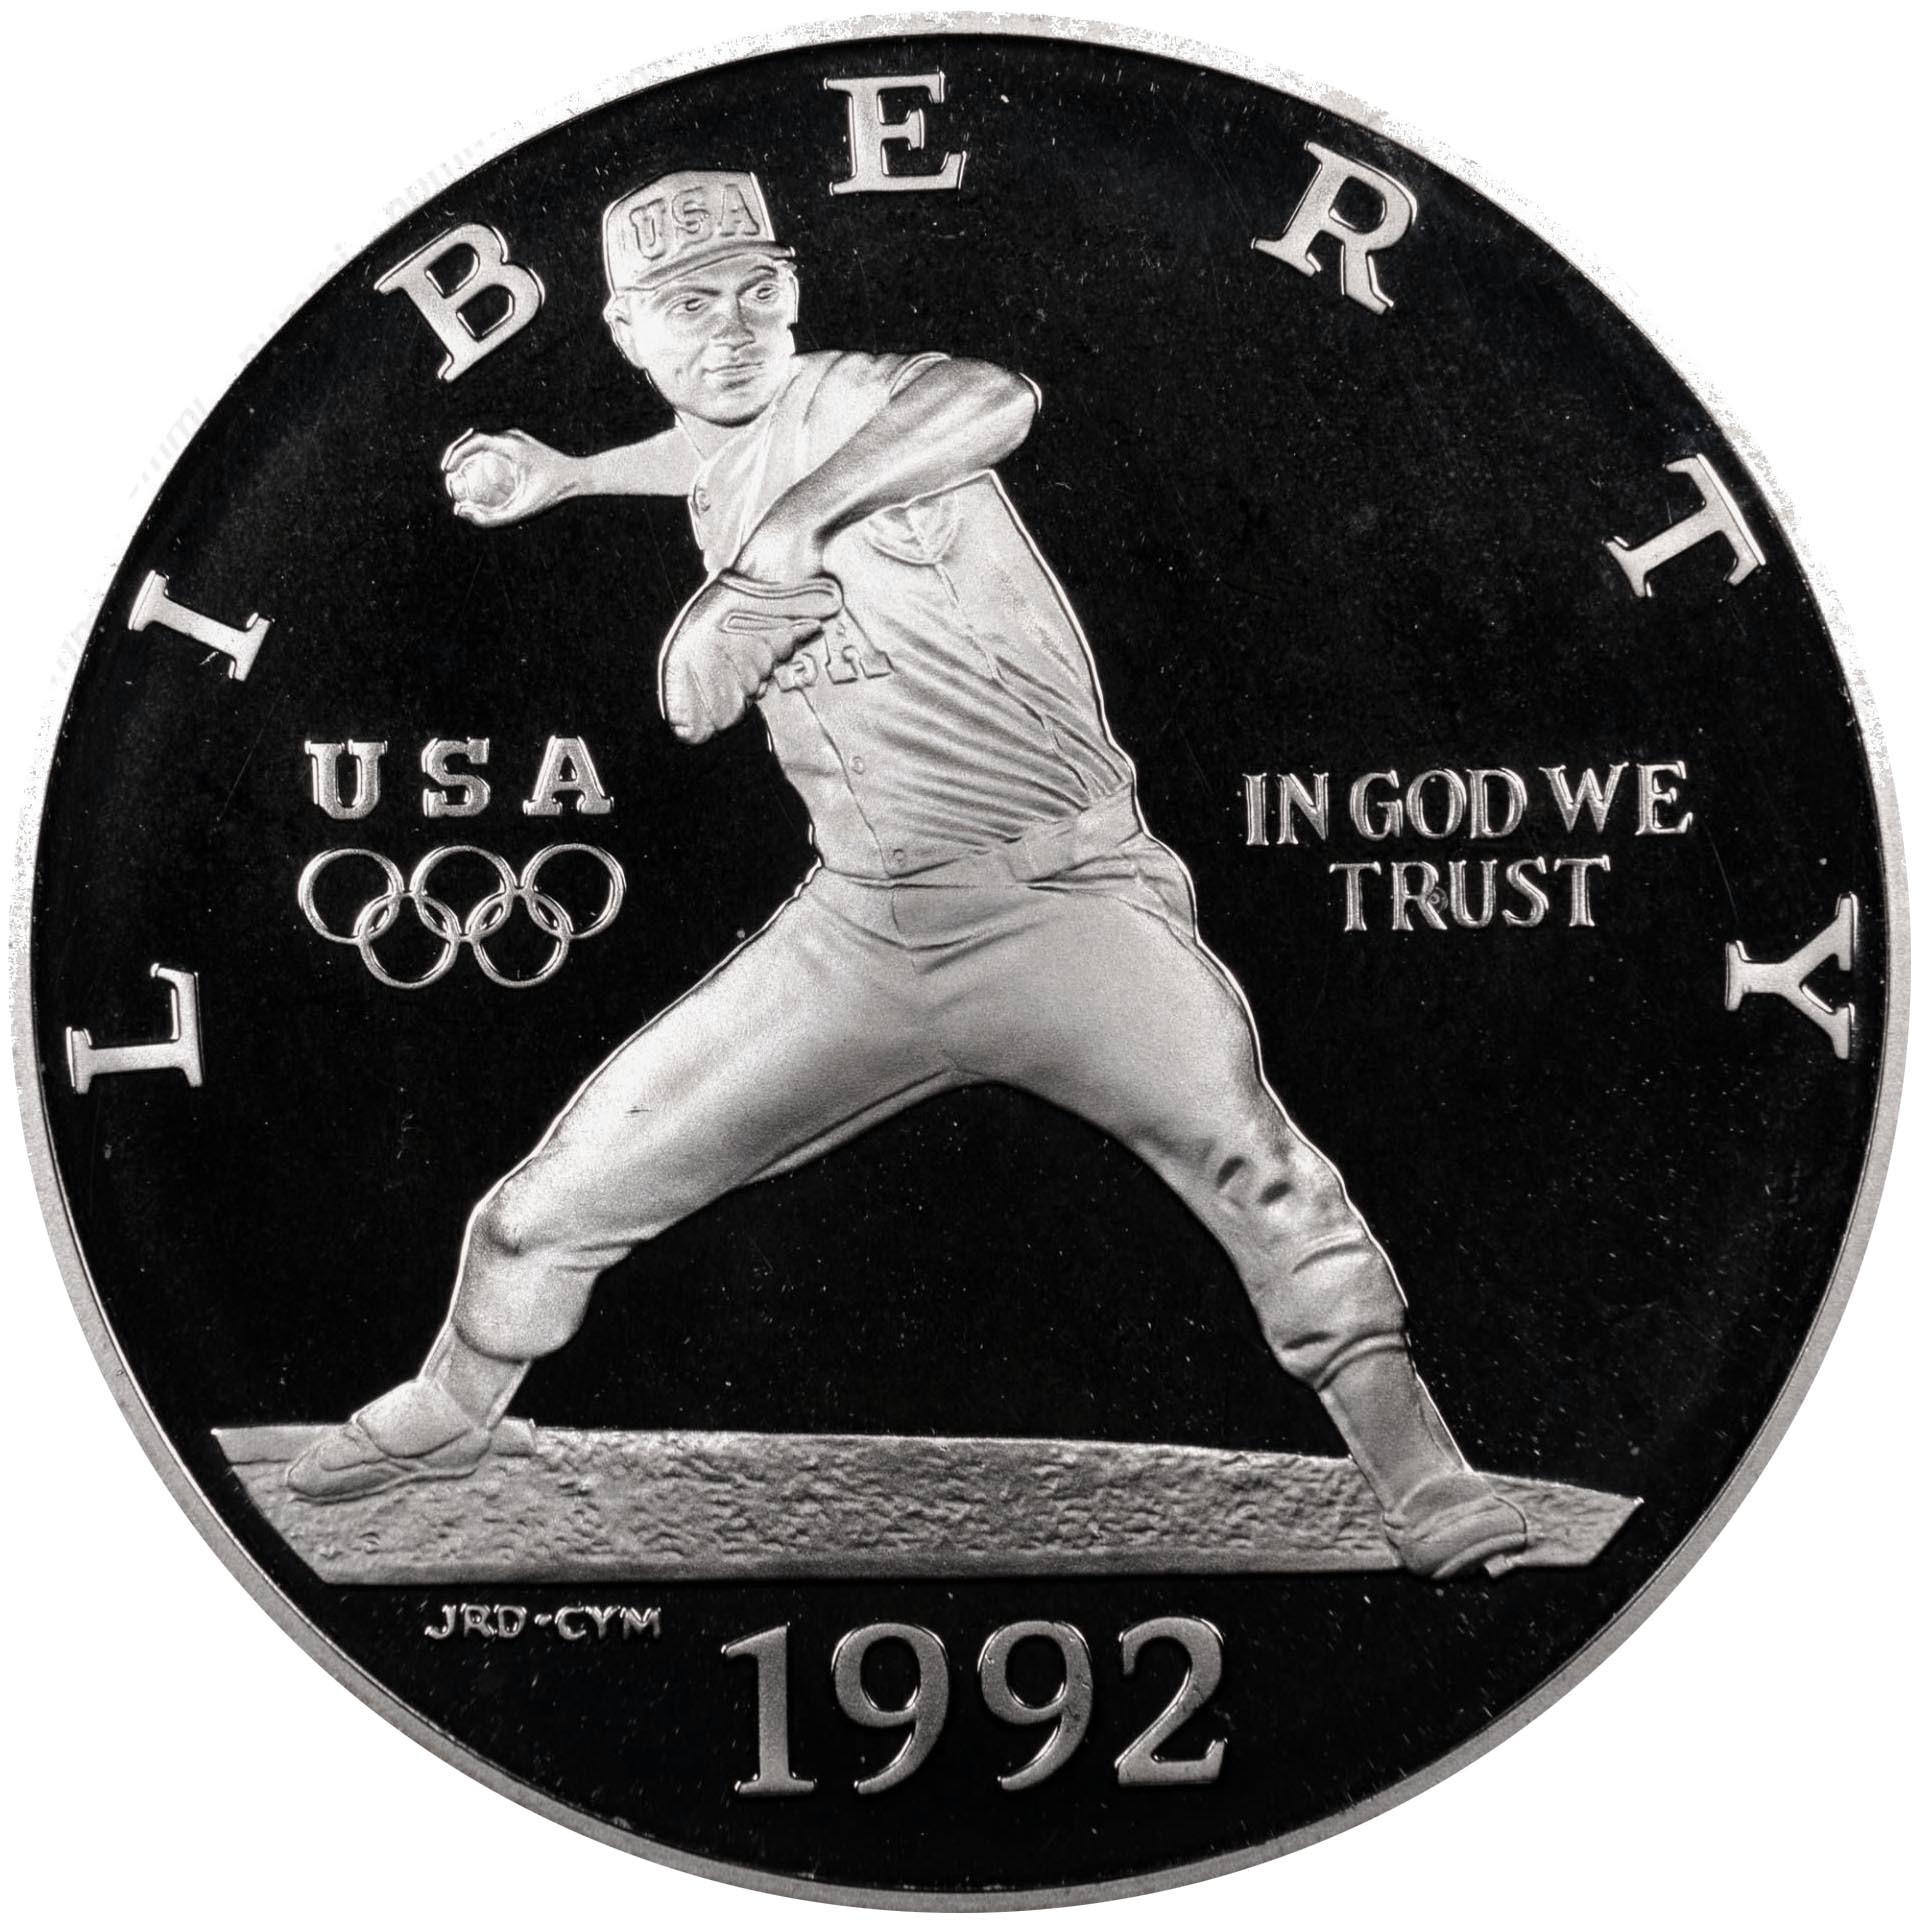 1 доллар. XXV Летние Олимпийские игры 1992 года в Барселоне. Бейсбол (S) 1992 г. PROOF Серебро